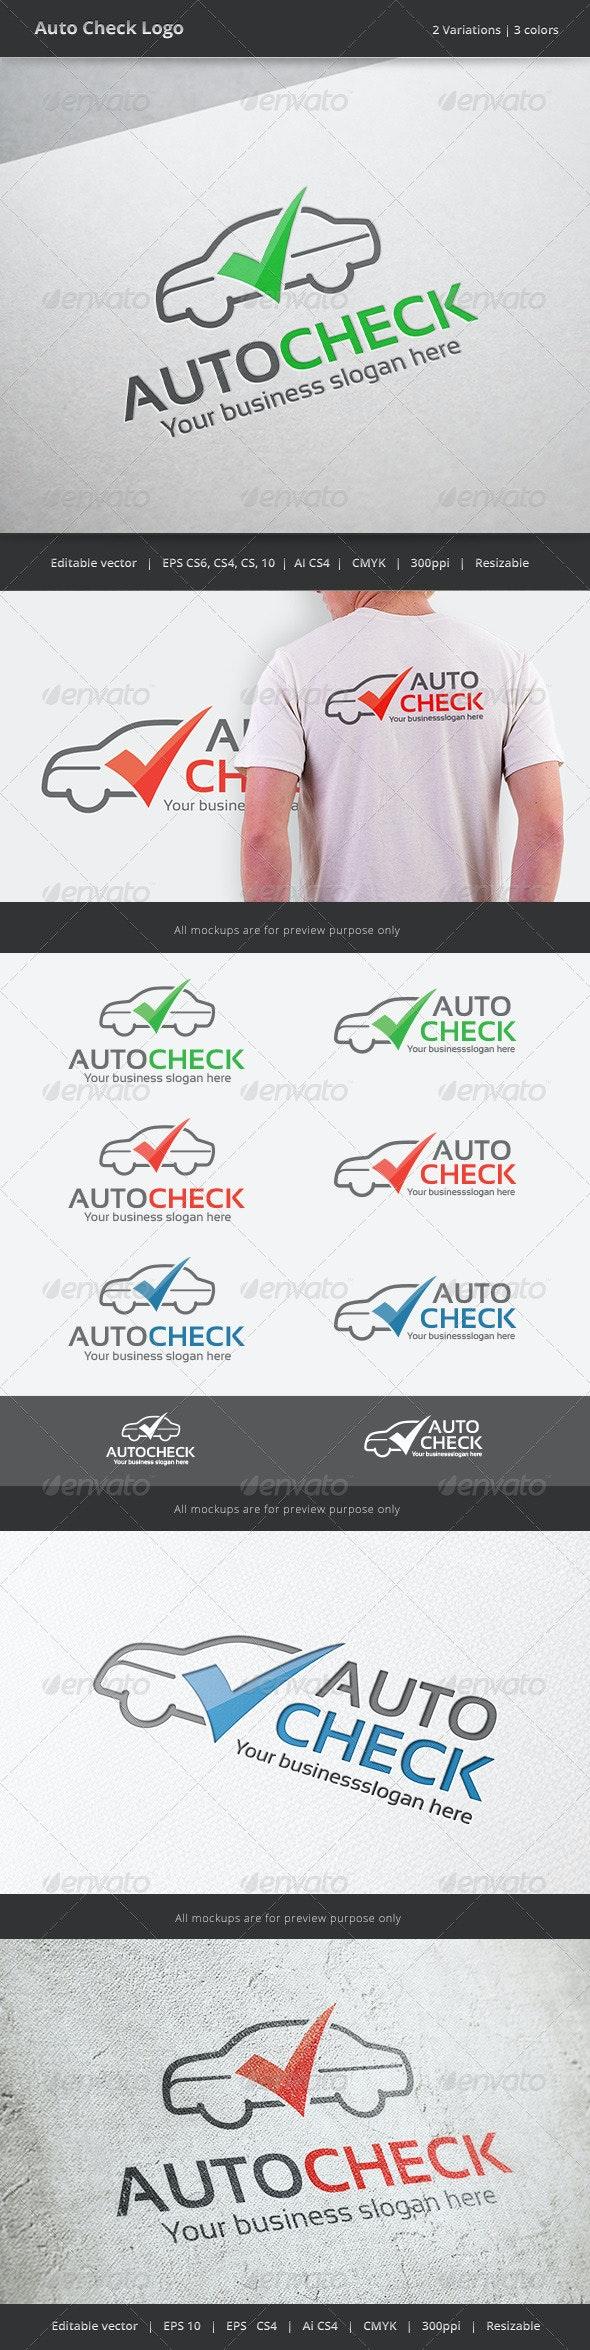 Auto Check Car Logo - Objects Logo Templates